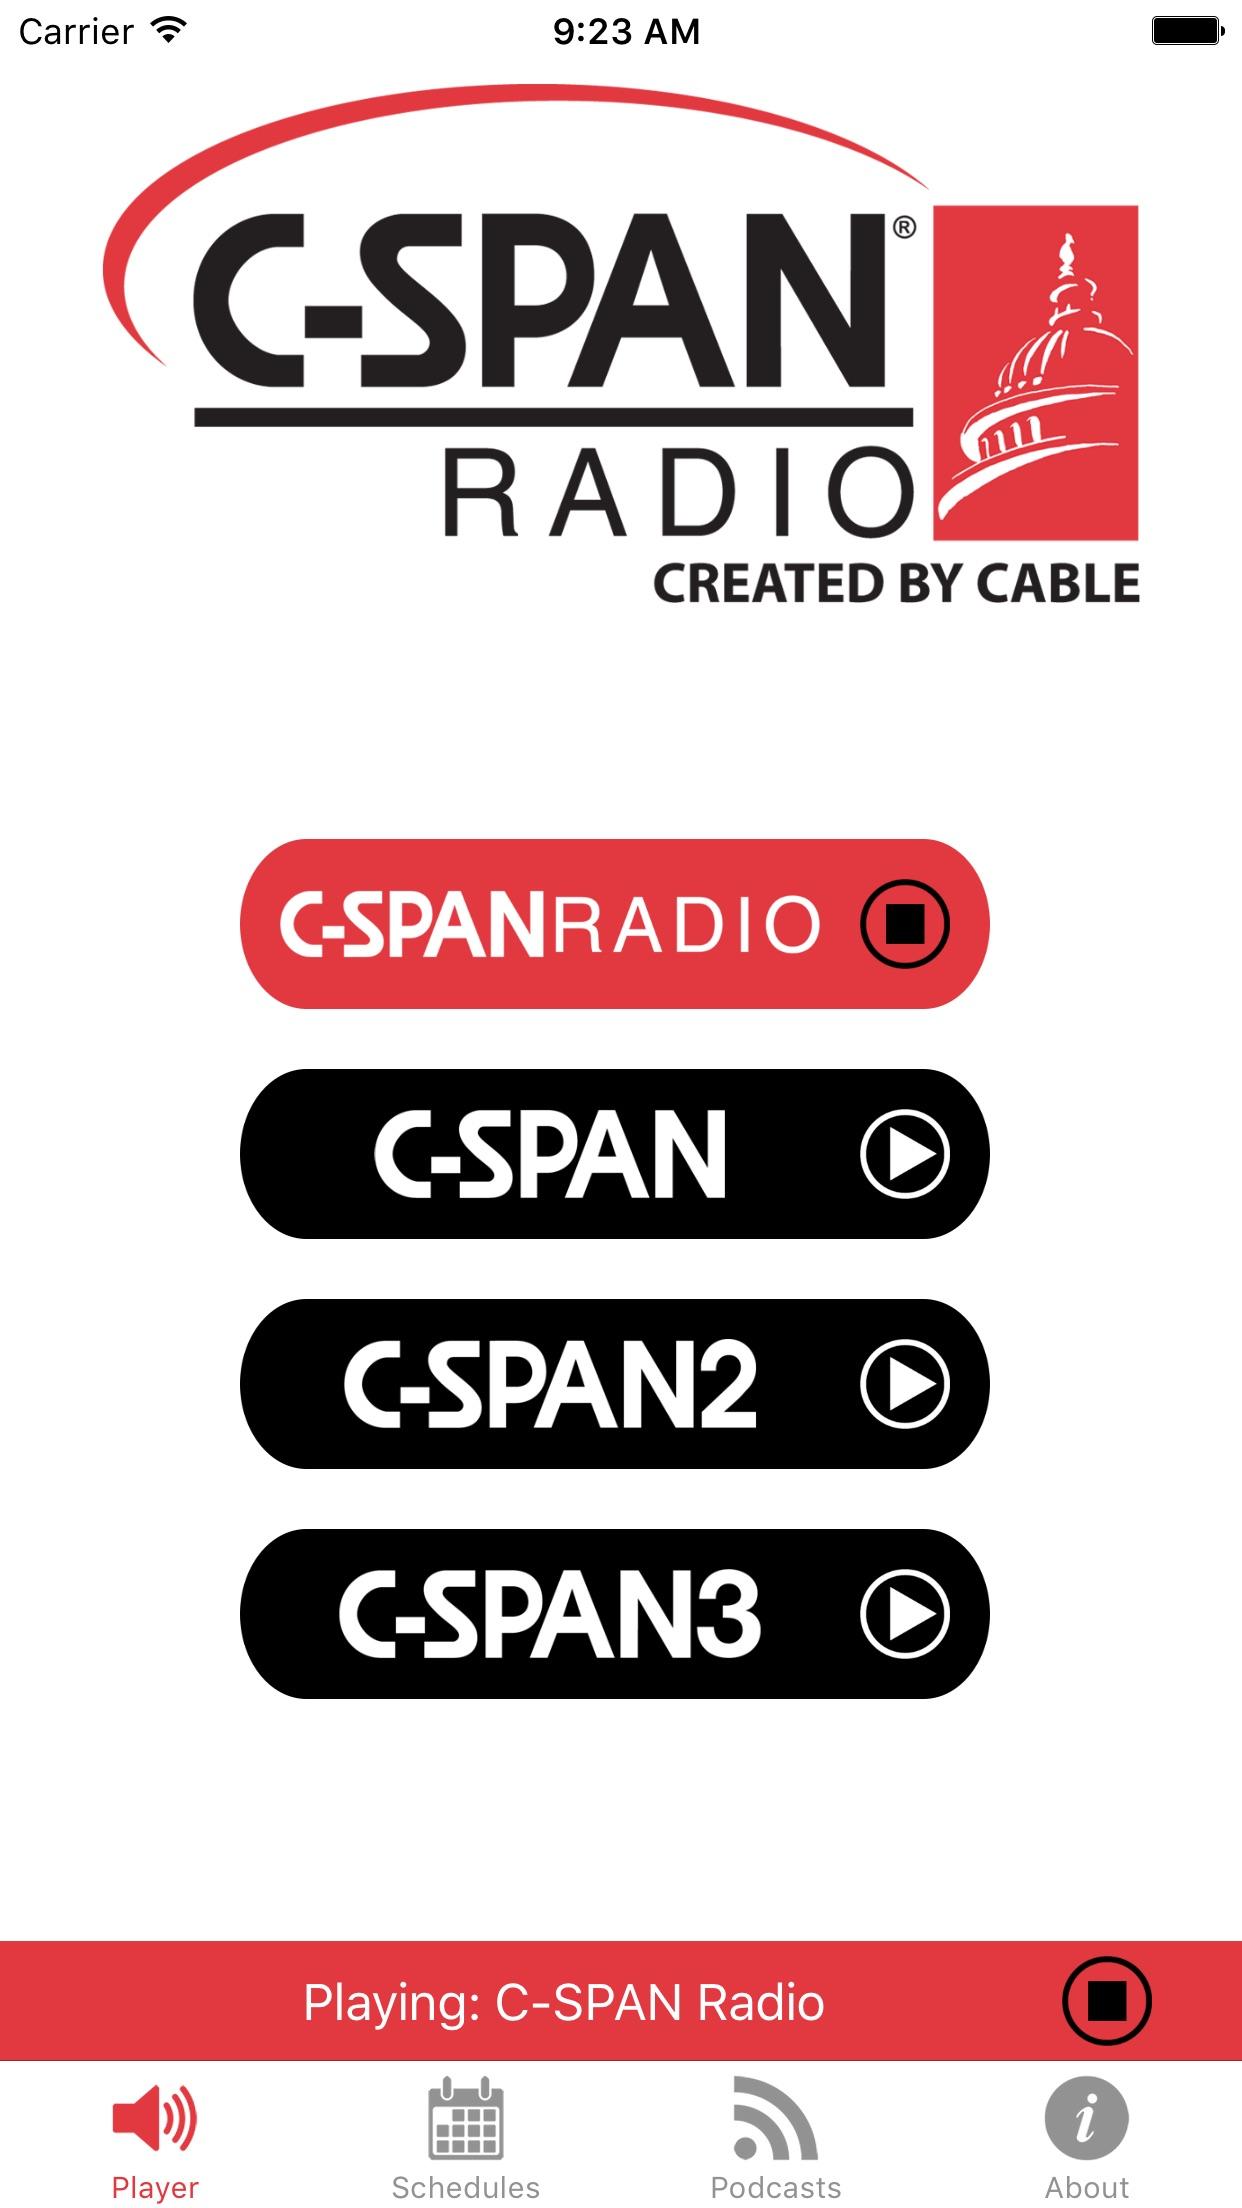 C-SPAN RADIO Screenshot